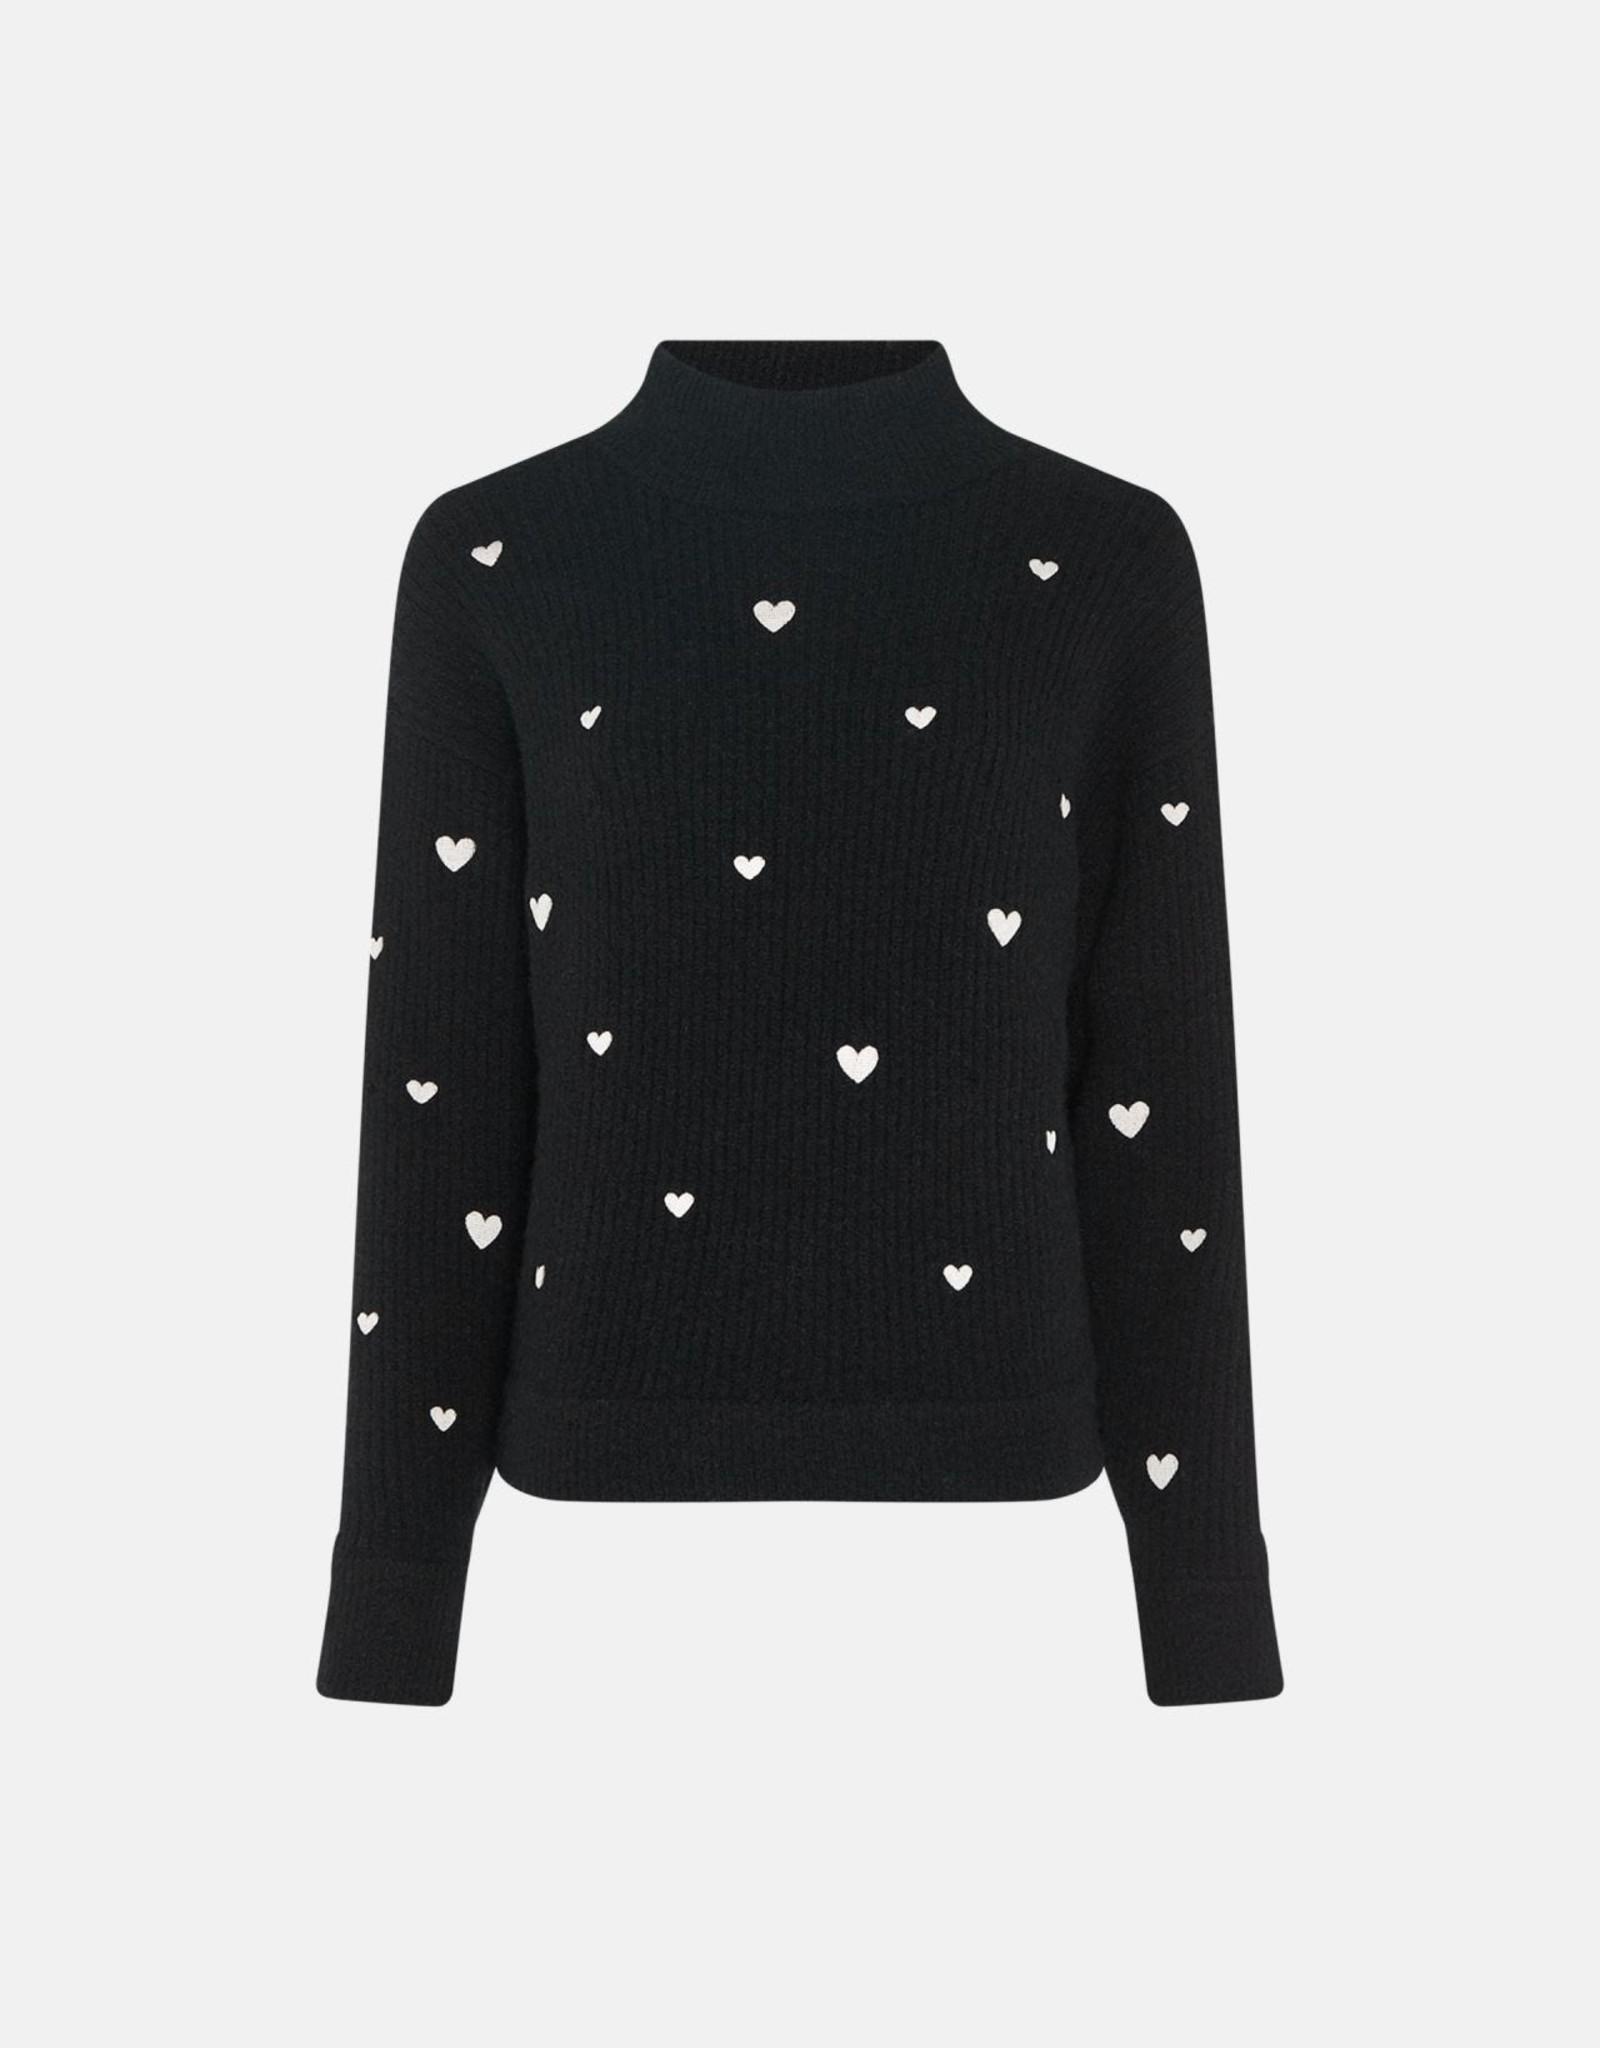 Fabienne Chapot Oliviana Pullover Black Cream White